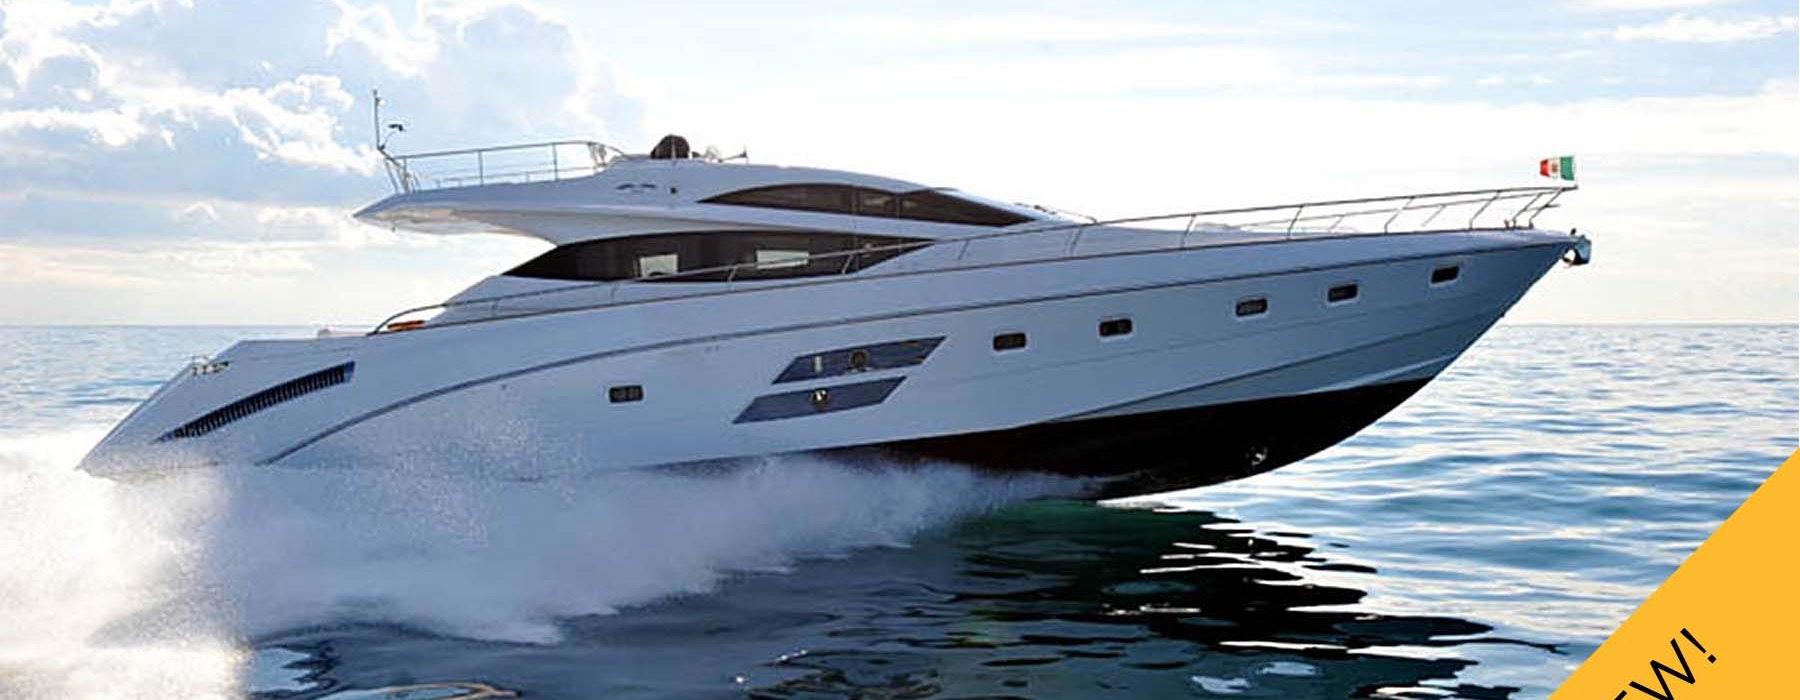 Flybridge yacht-PHANTOM-1 Sarnico 24m for sale NEW CA